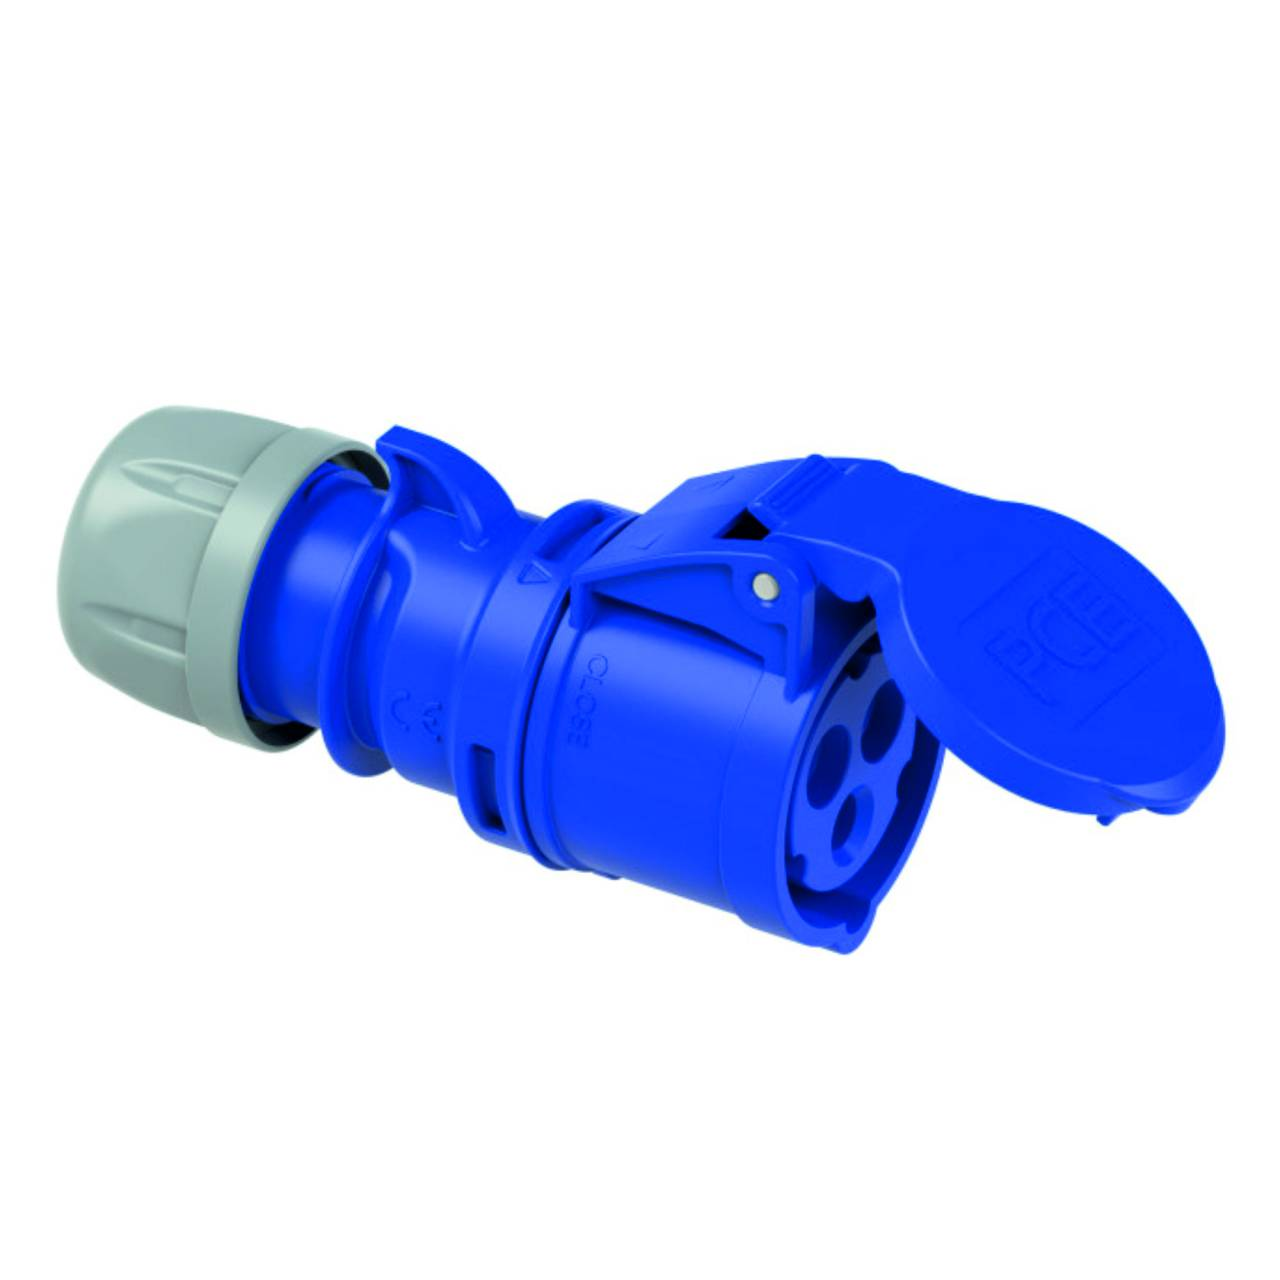 CEE-Stecker 3-polig, 230V /16 A, IP44, schraubbar